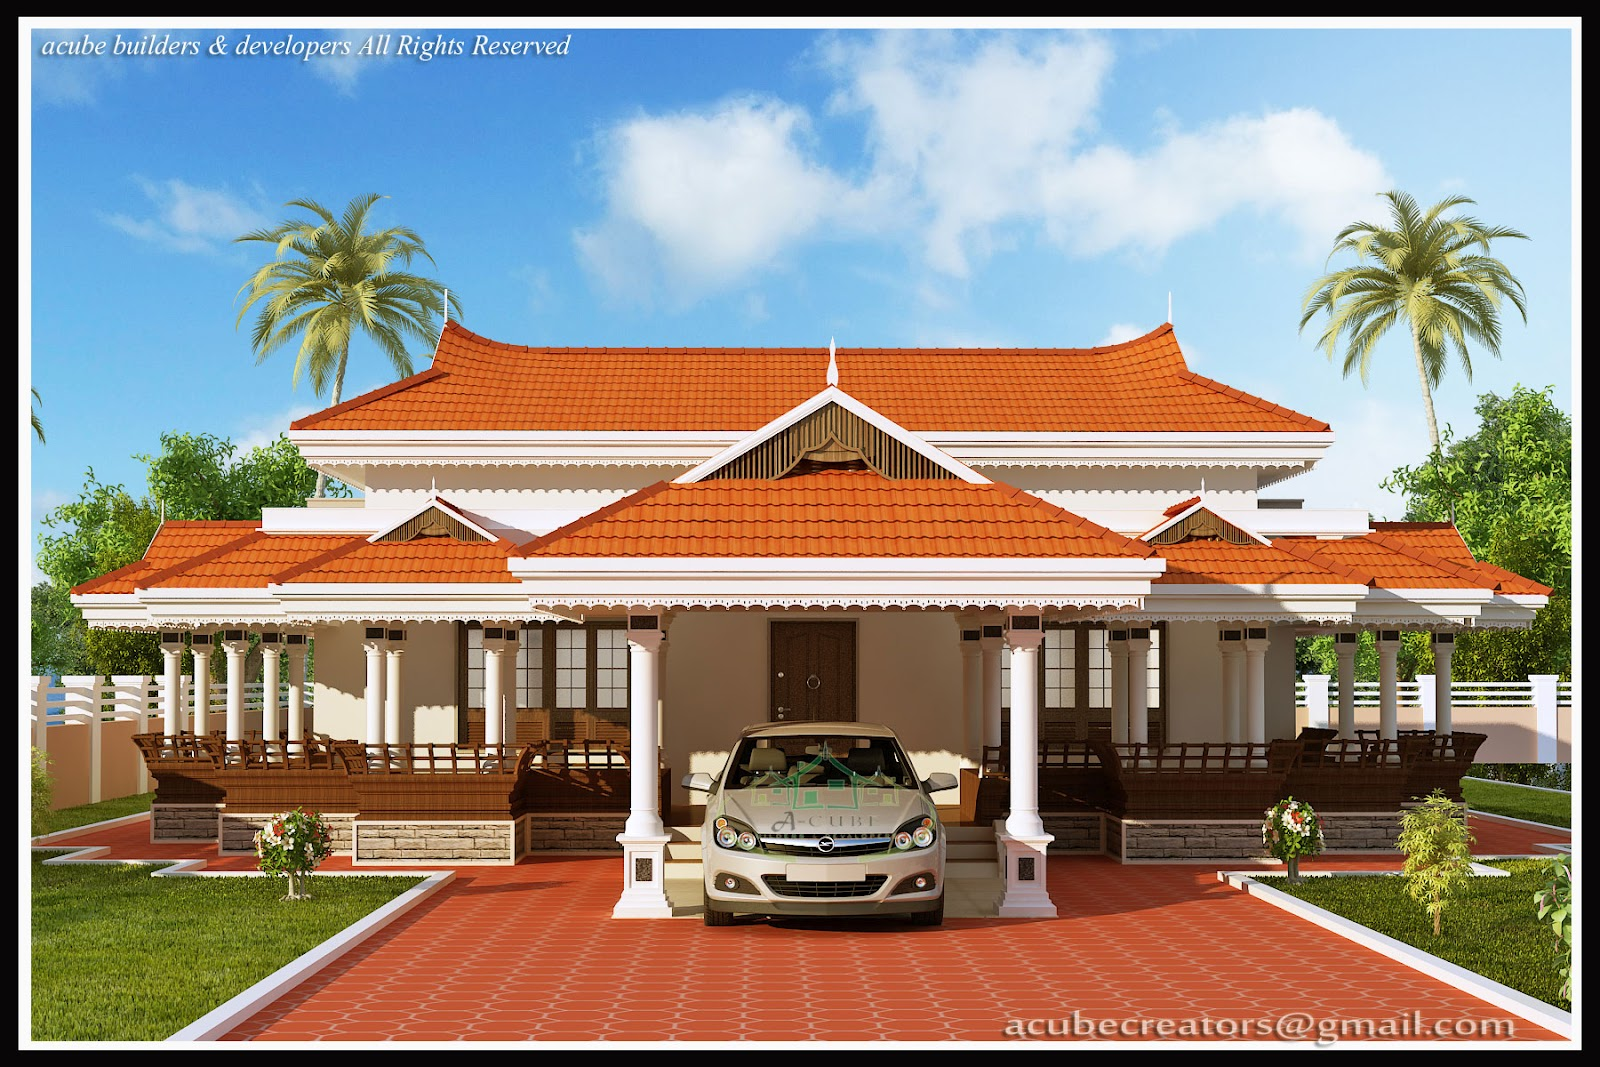 Kerala model house 2292 sq ft plan 120 acube for Kerala model house plans 1500 sq ft